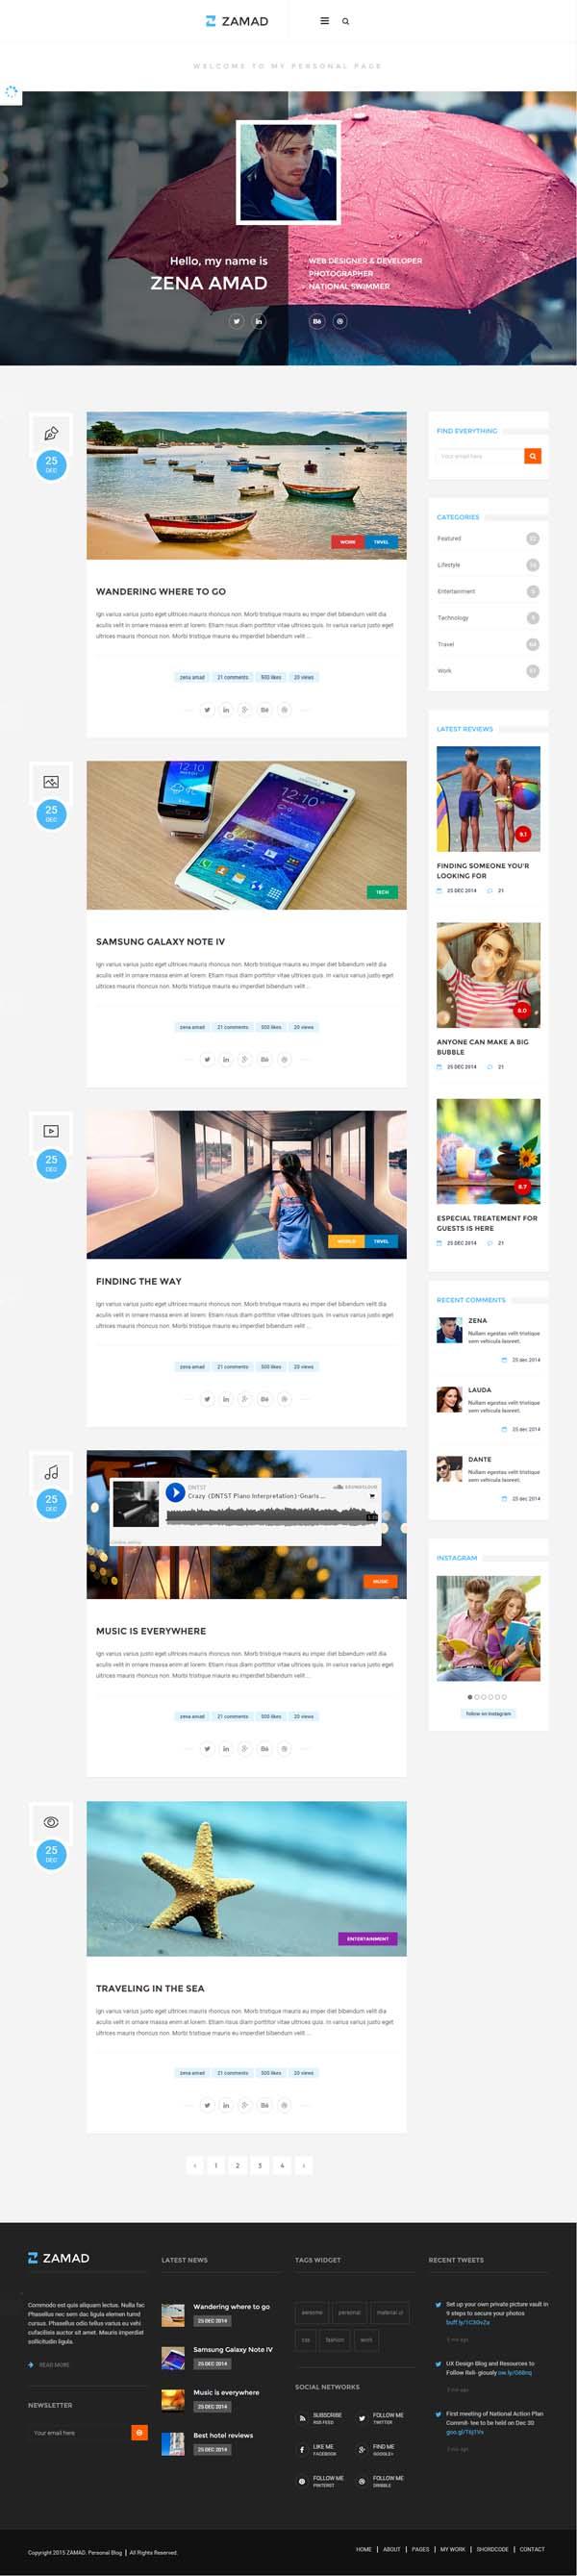 Zamad | Personal HTML5 Blog Template